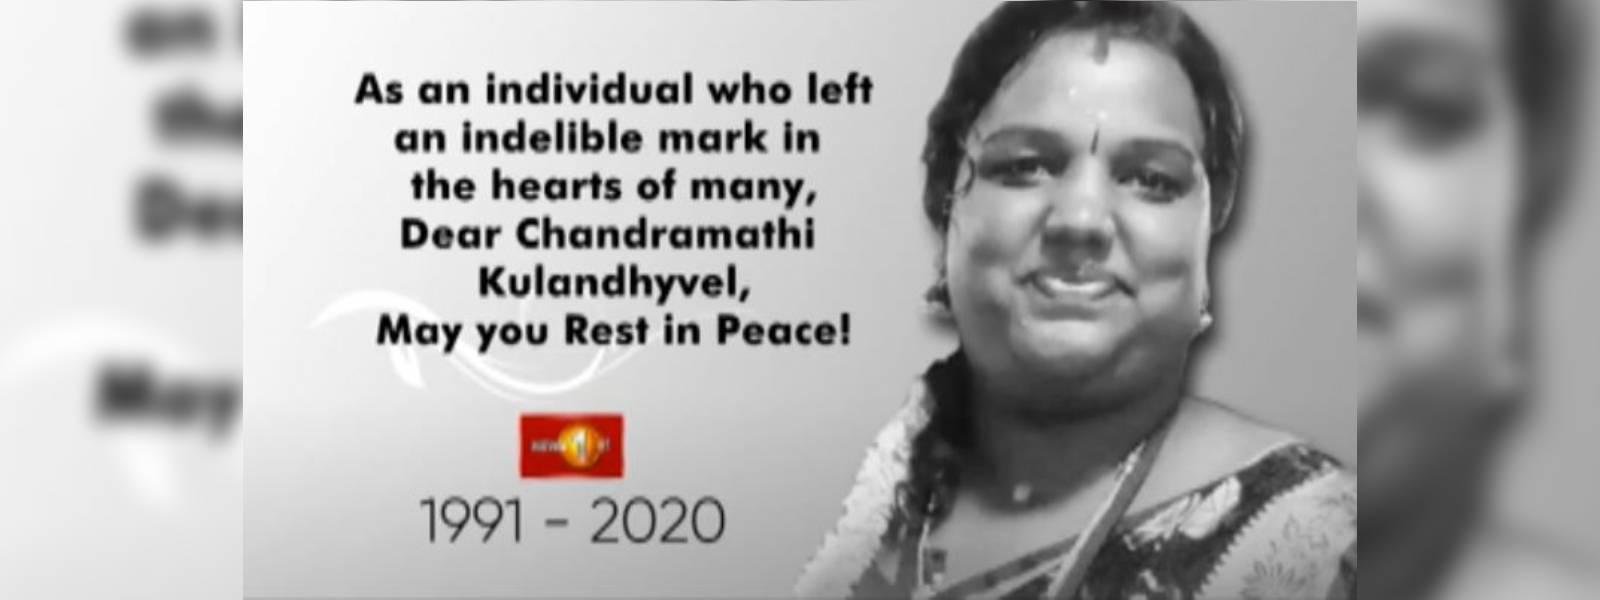 Final rites of News 1st journalist Chandramathi Kulandhyvel to be held tomorrow